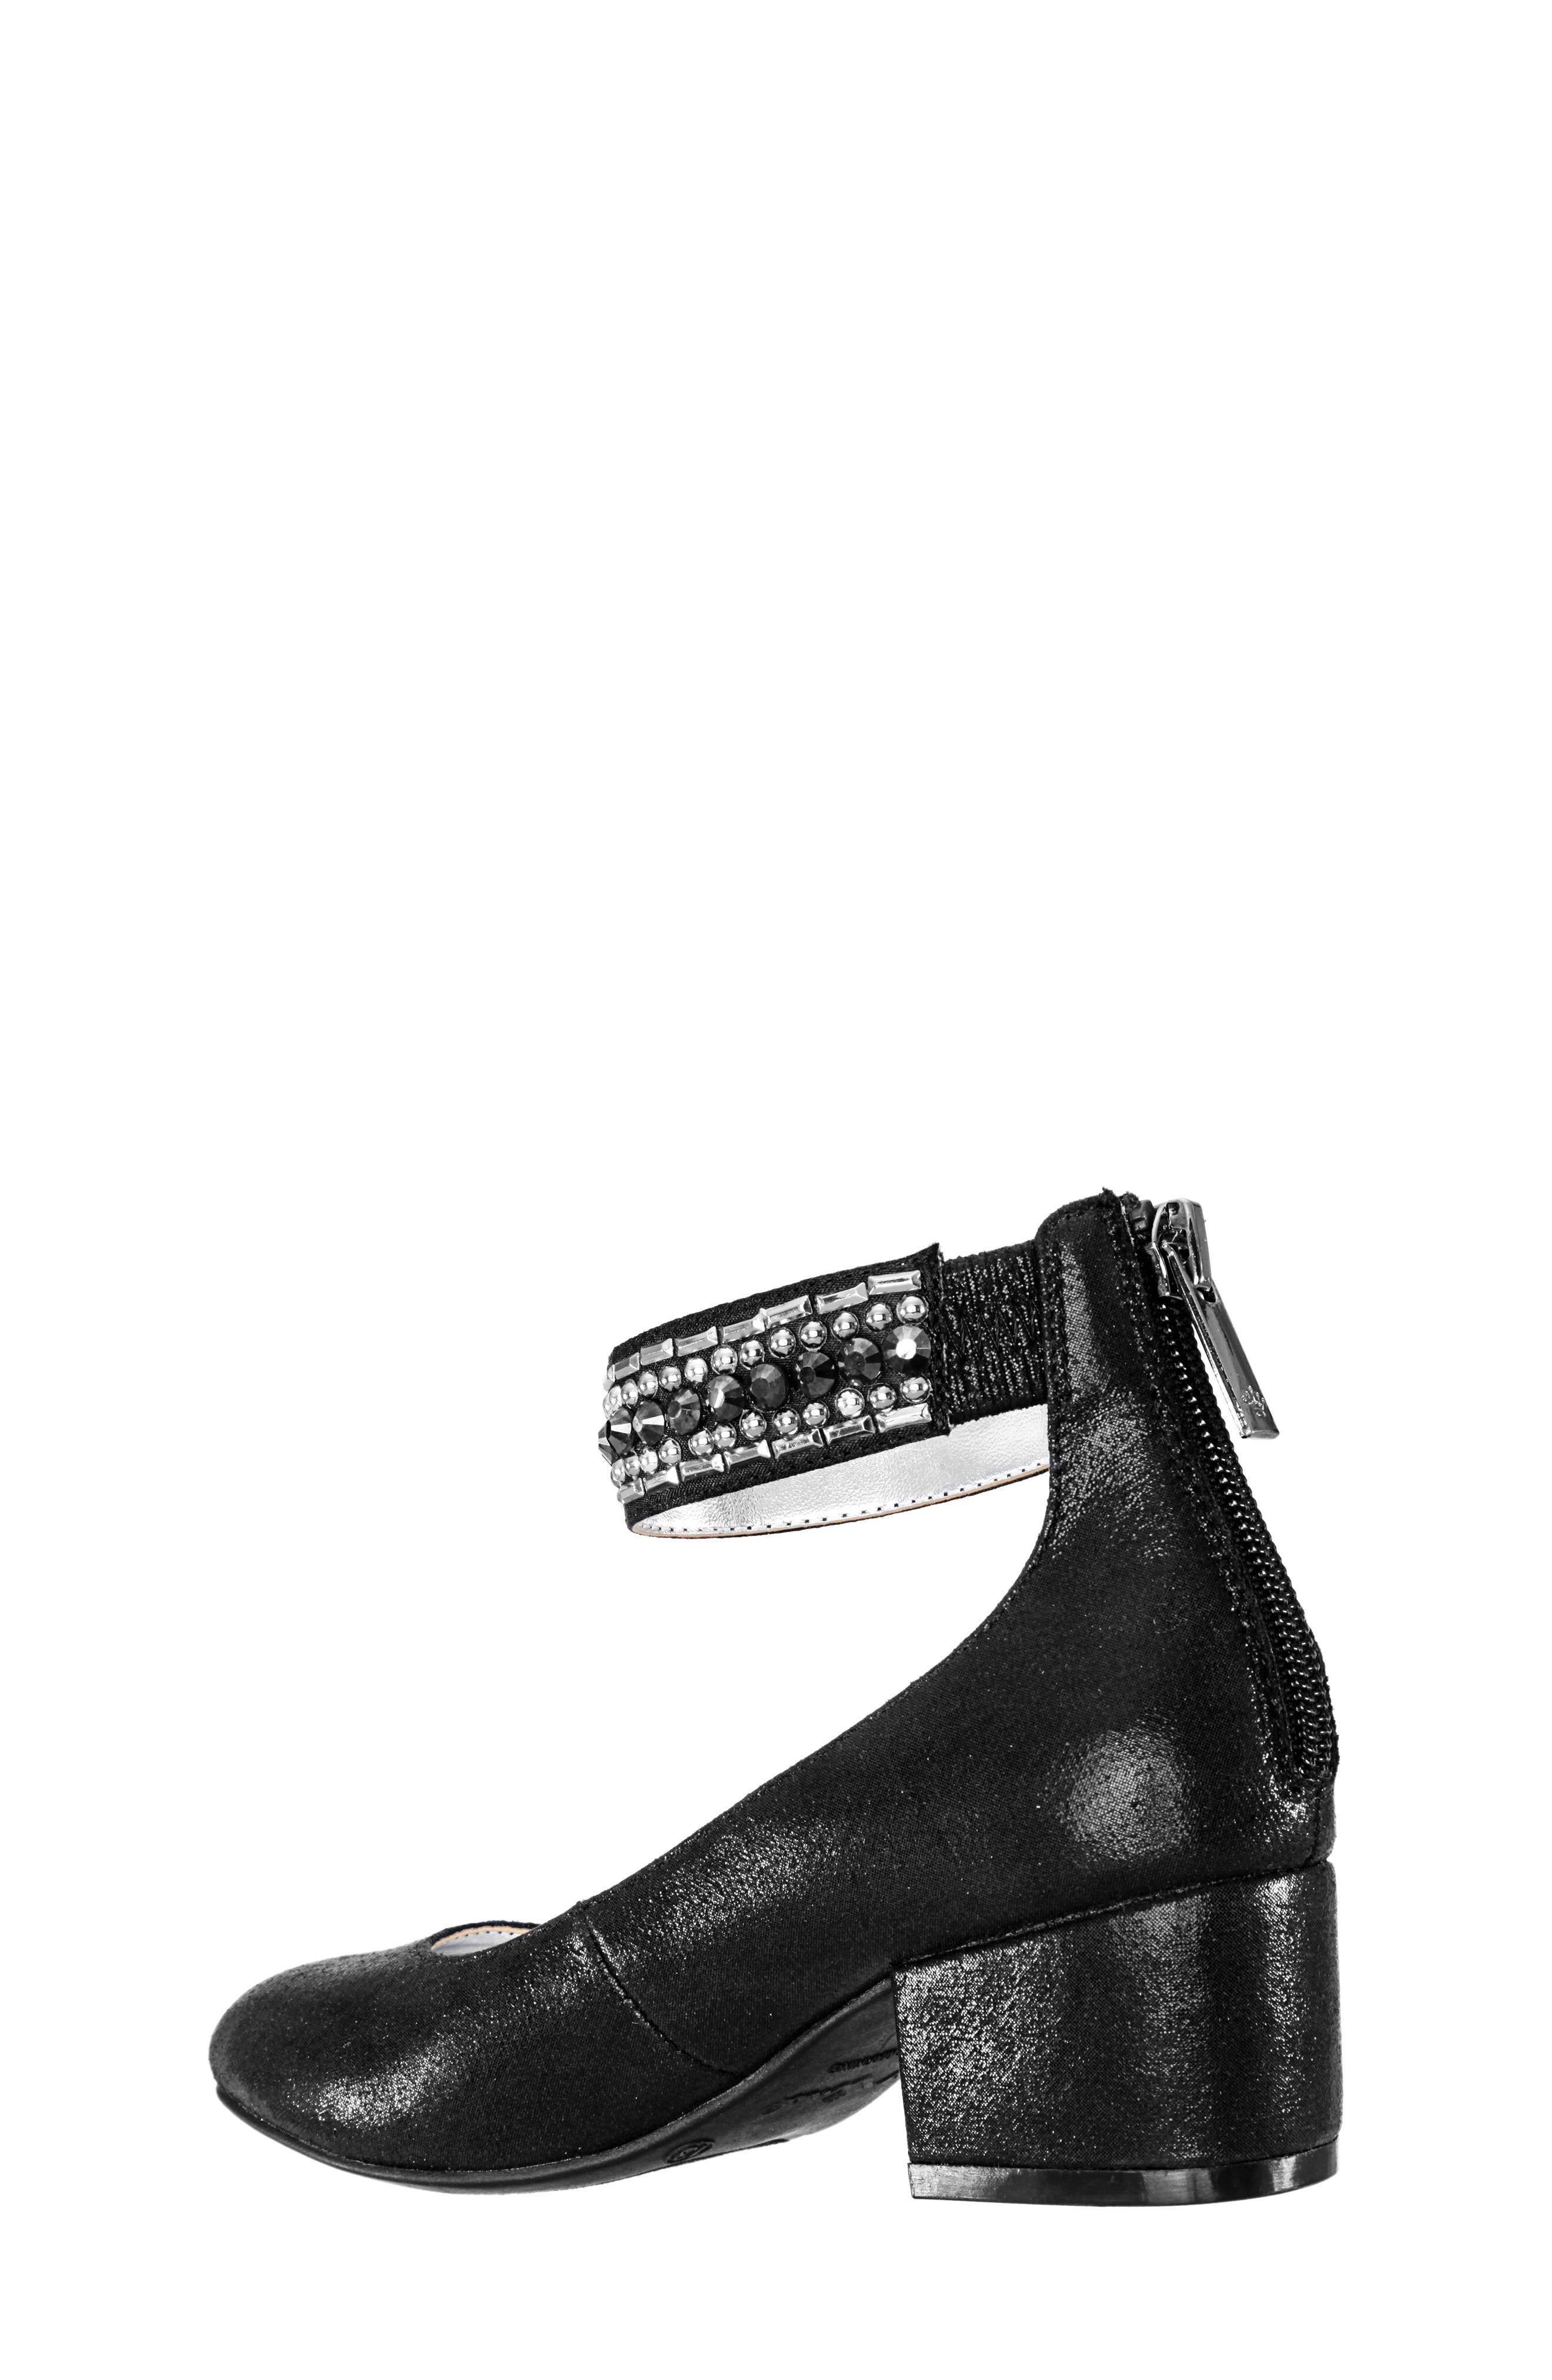 Charleen Ankle Strap Pump,                             Alternate thumbnail 2, color,                             BLACK SHIMMER FABRIC